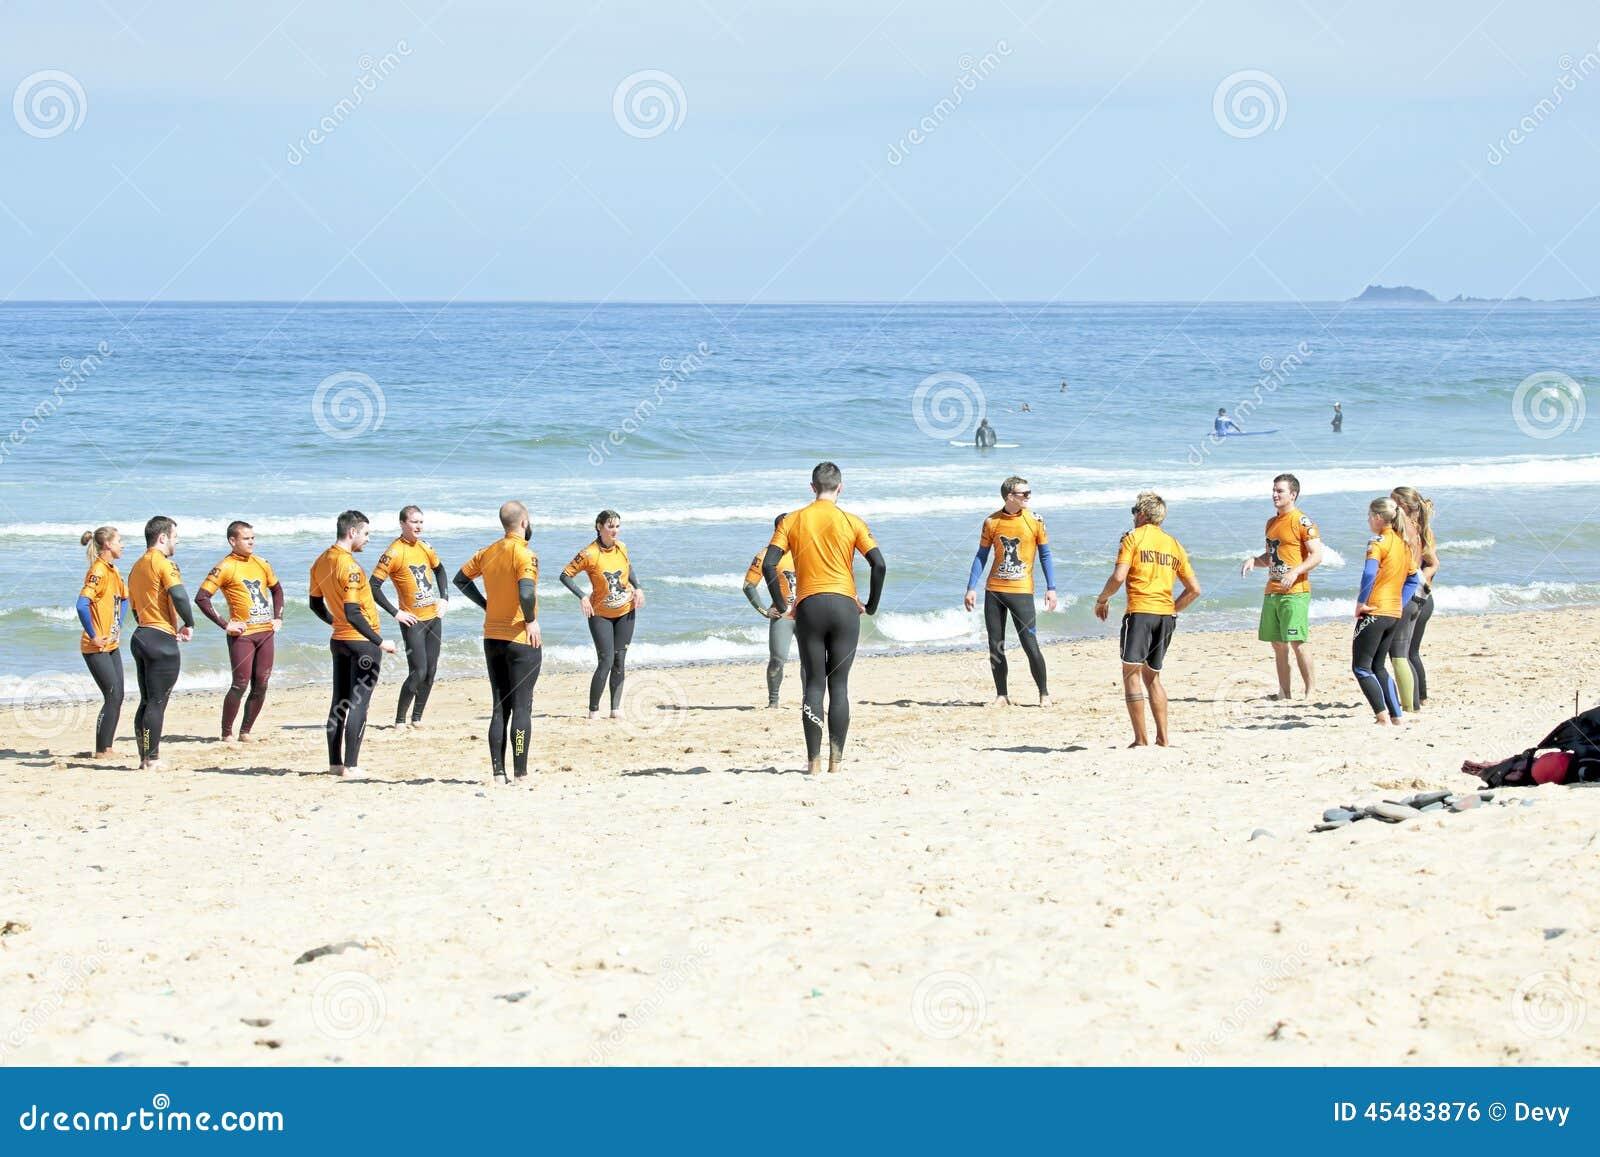 谷FIGUEIRAS,葡萄牙-做excersises的冲浪者